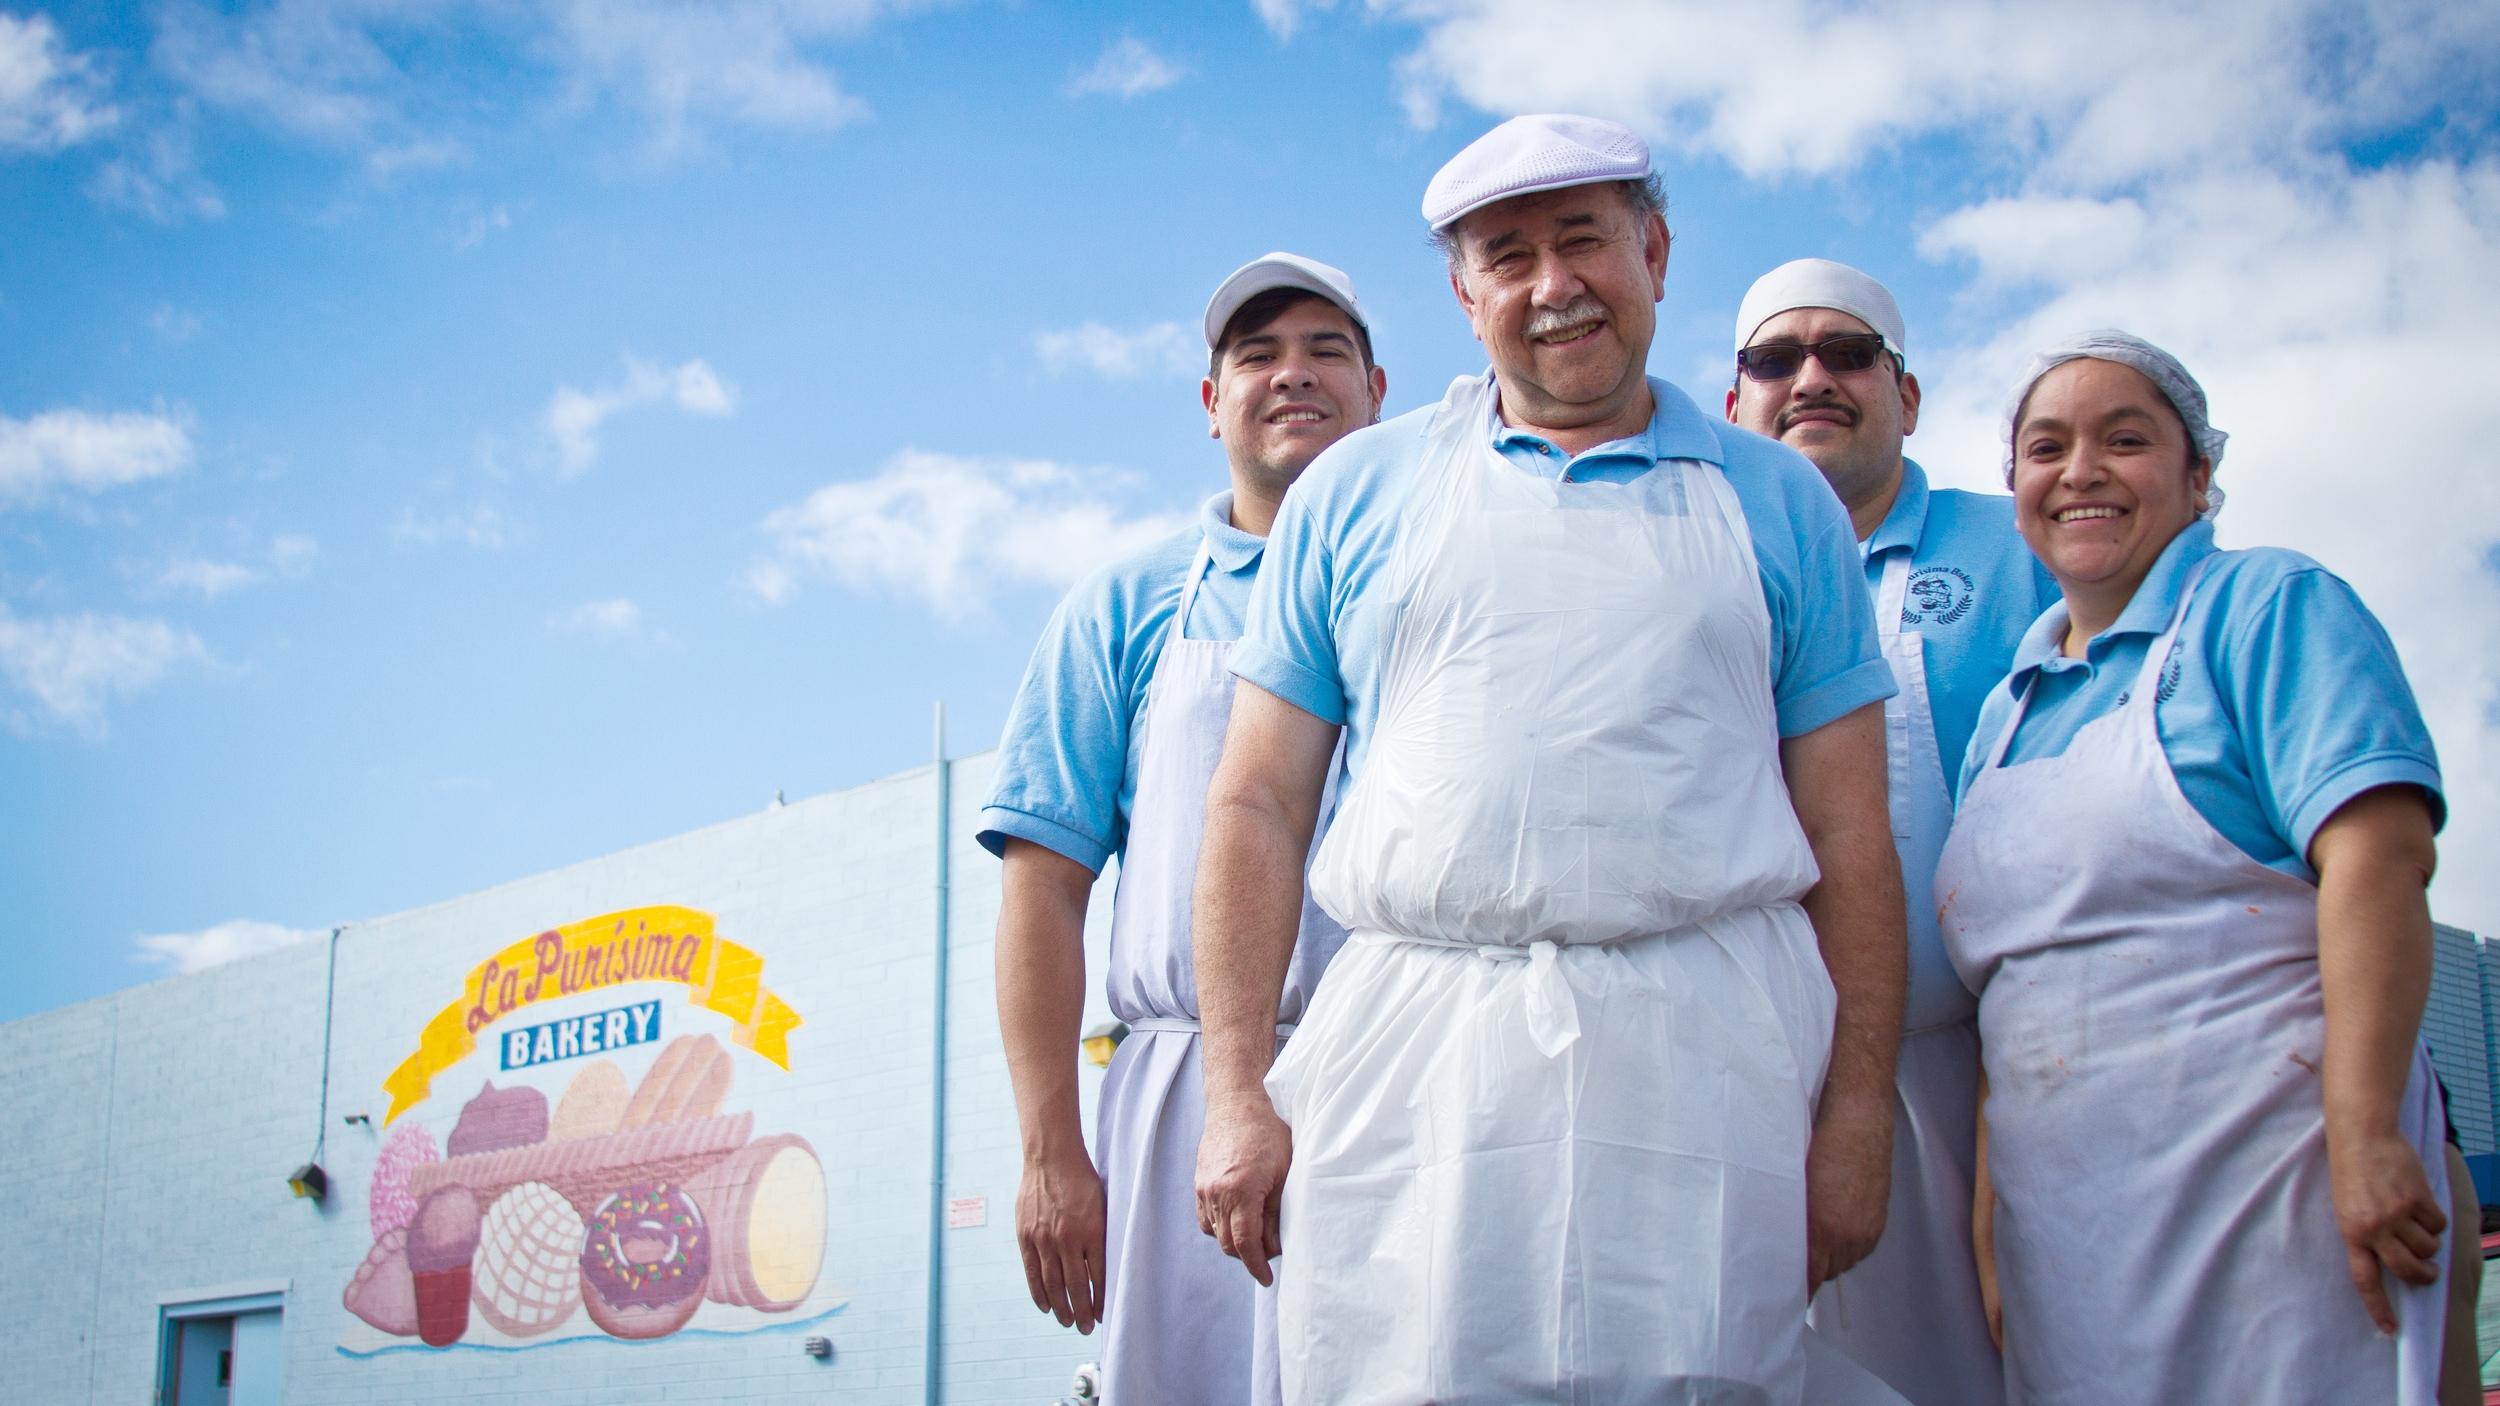 La Purisima Bakery in Glendale Arizona | Editorial Photographer